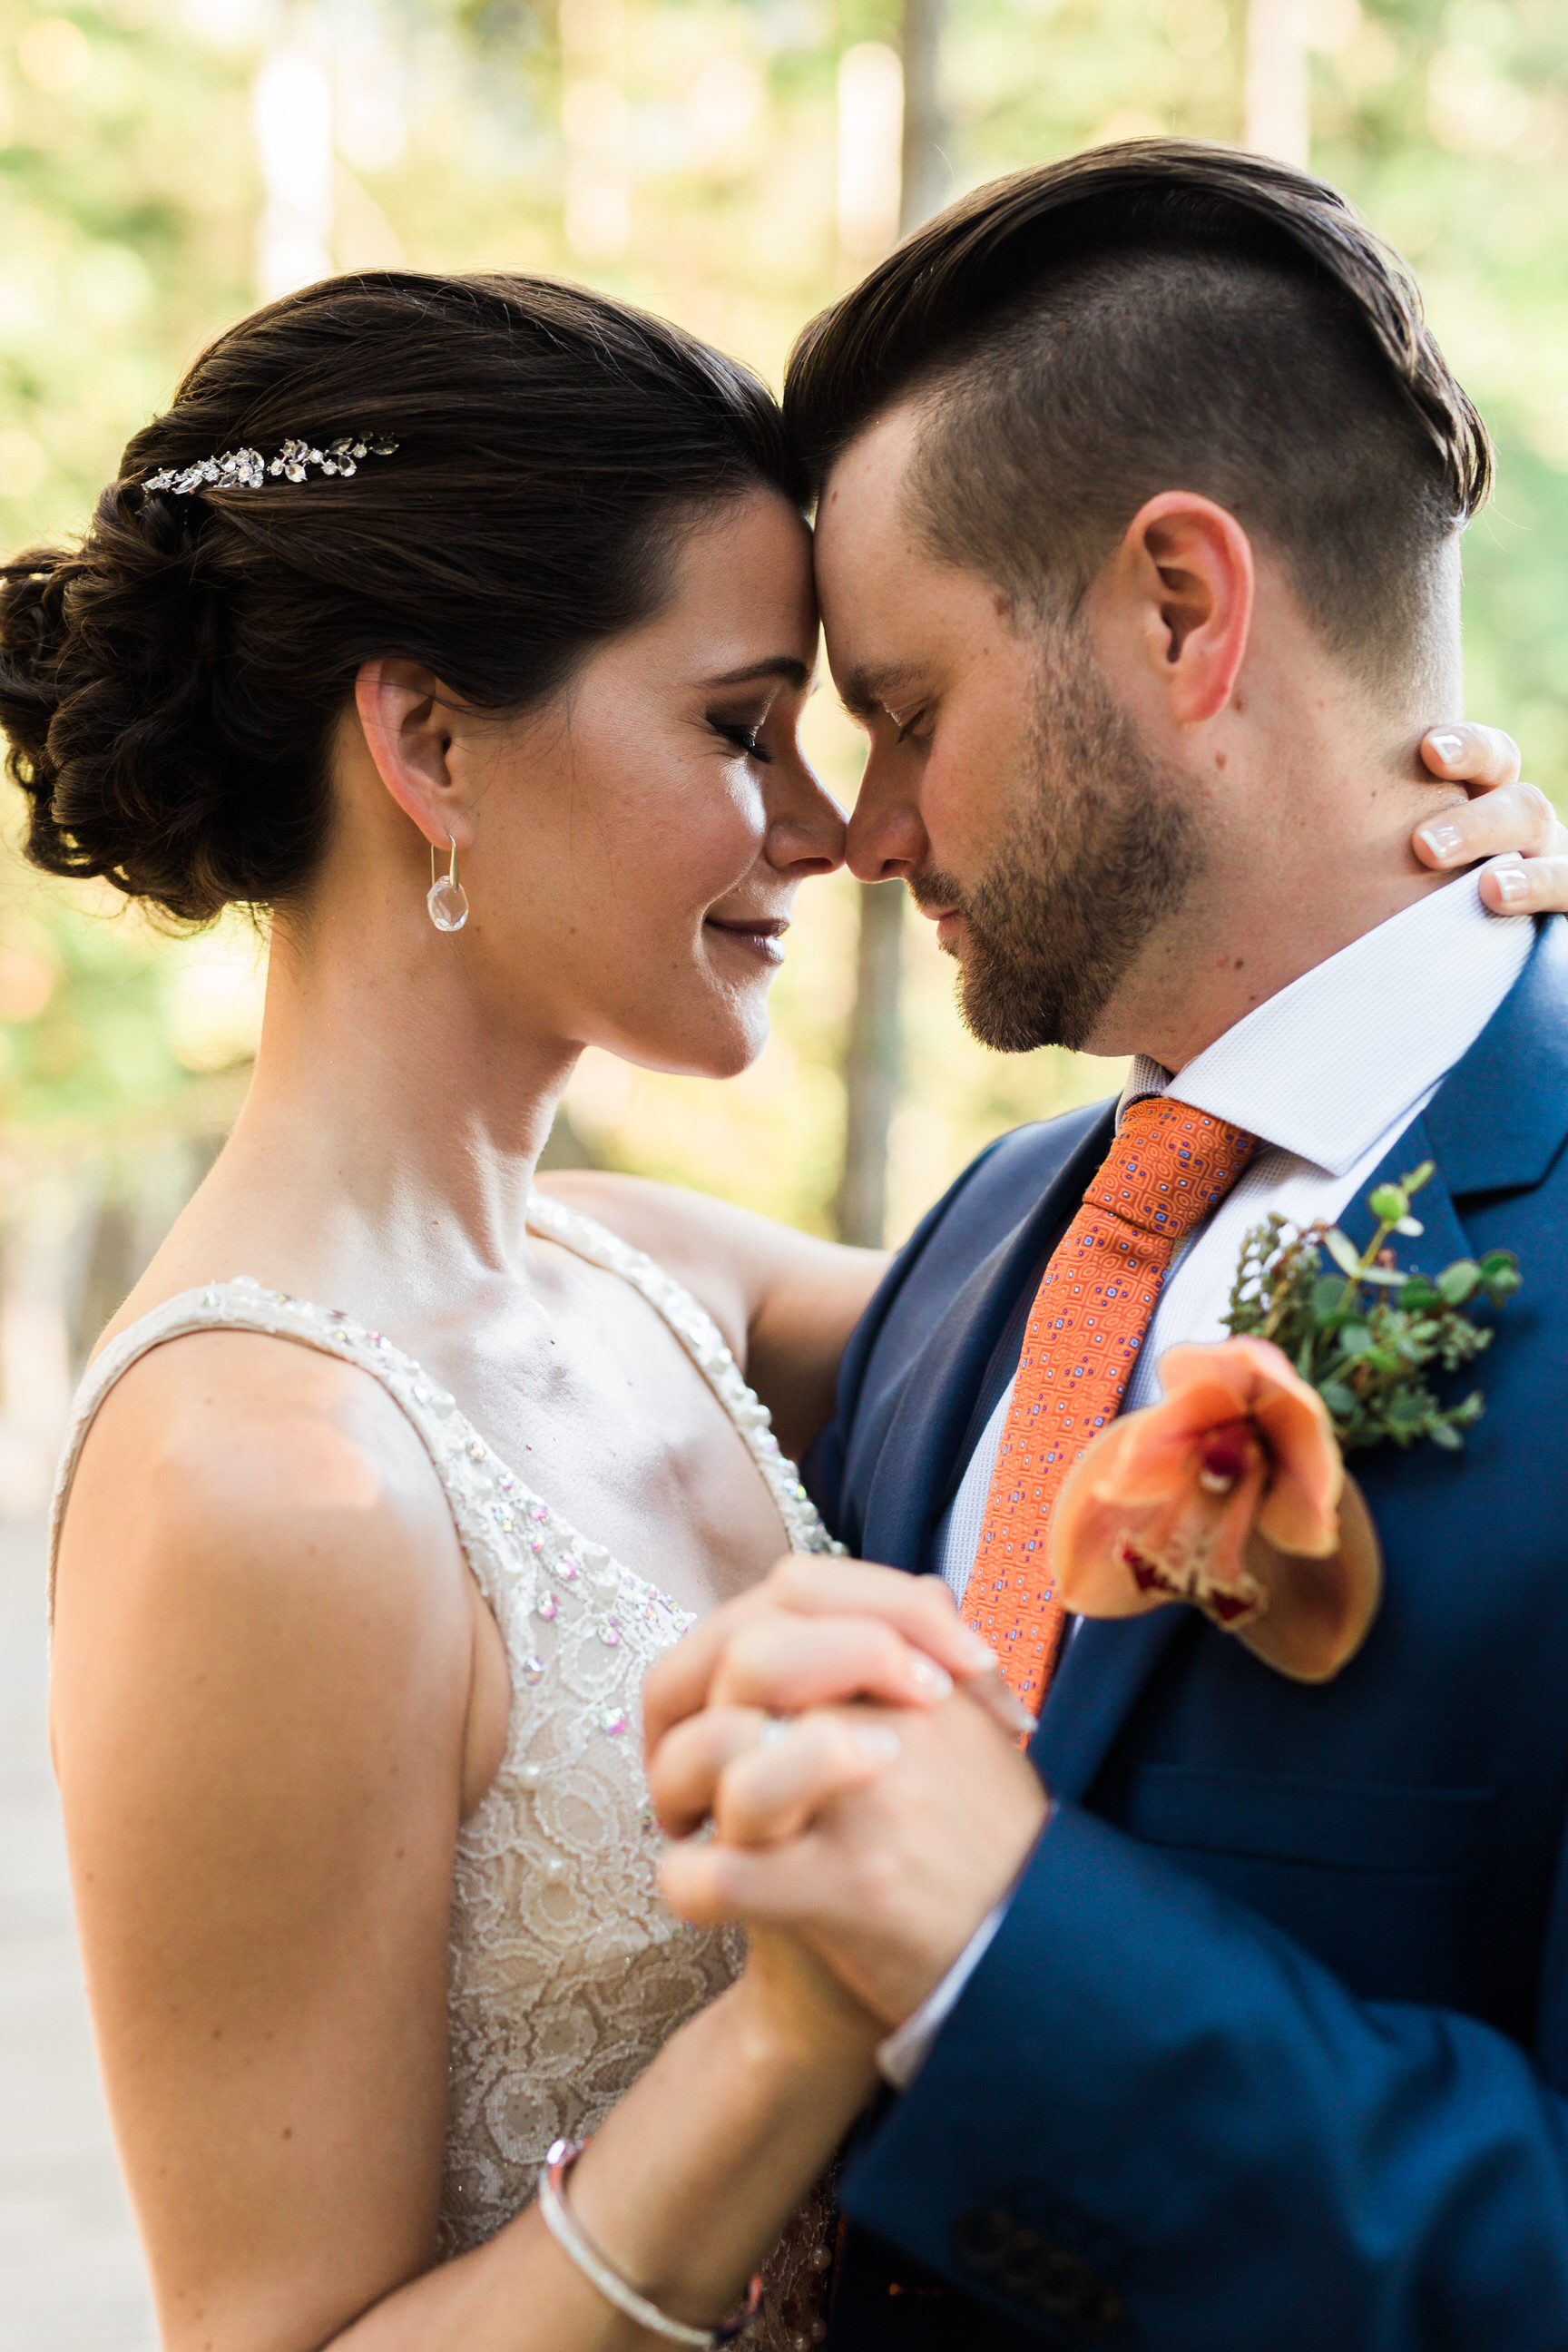 Rockwater Secret Cove Resort Wedding - Sunshine Coast BC Wedding Photographer - Vancouver Wedding Photographer - Sunshine Coast Elopement Photos - IMG_1033.jpg